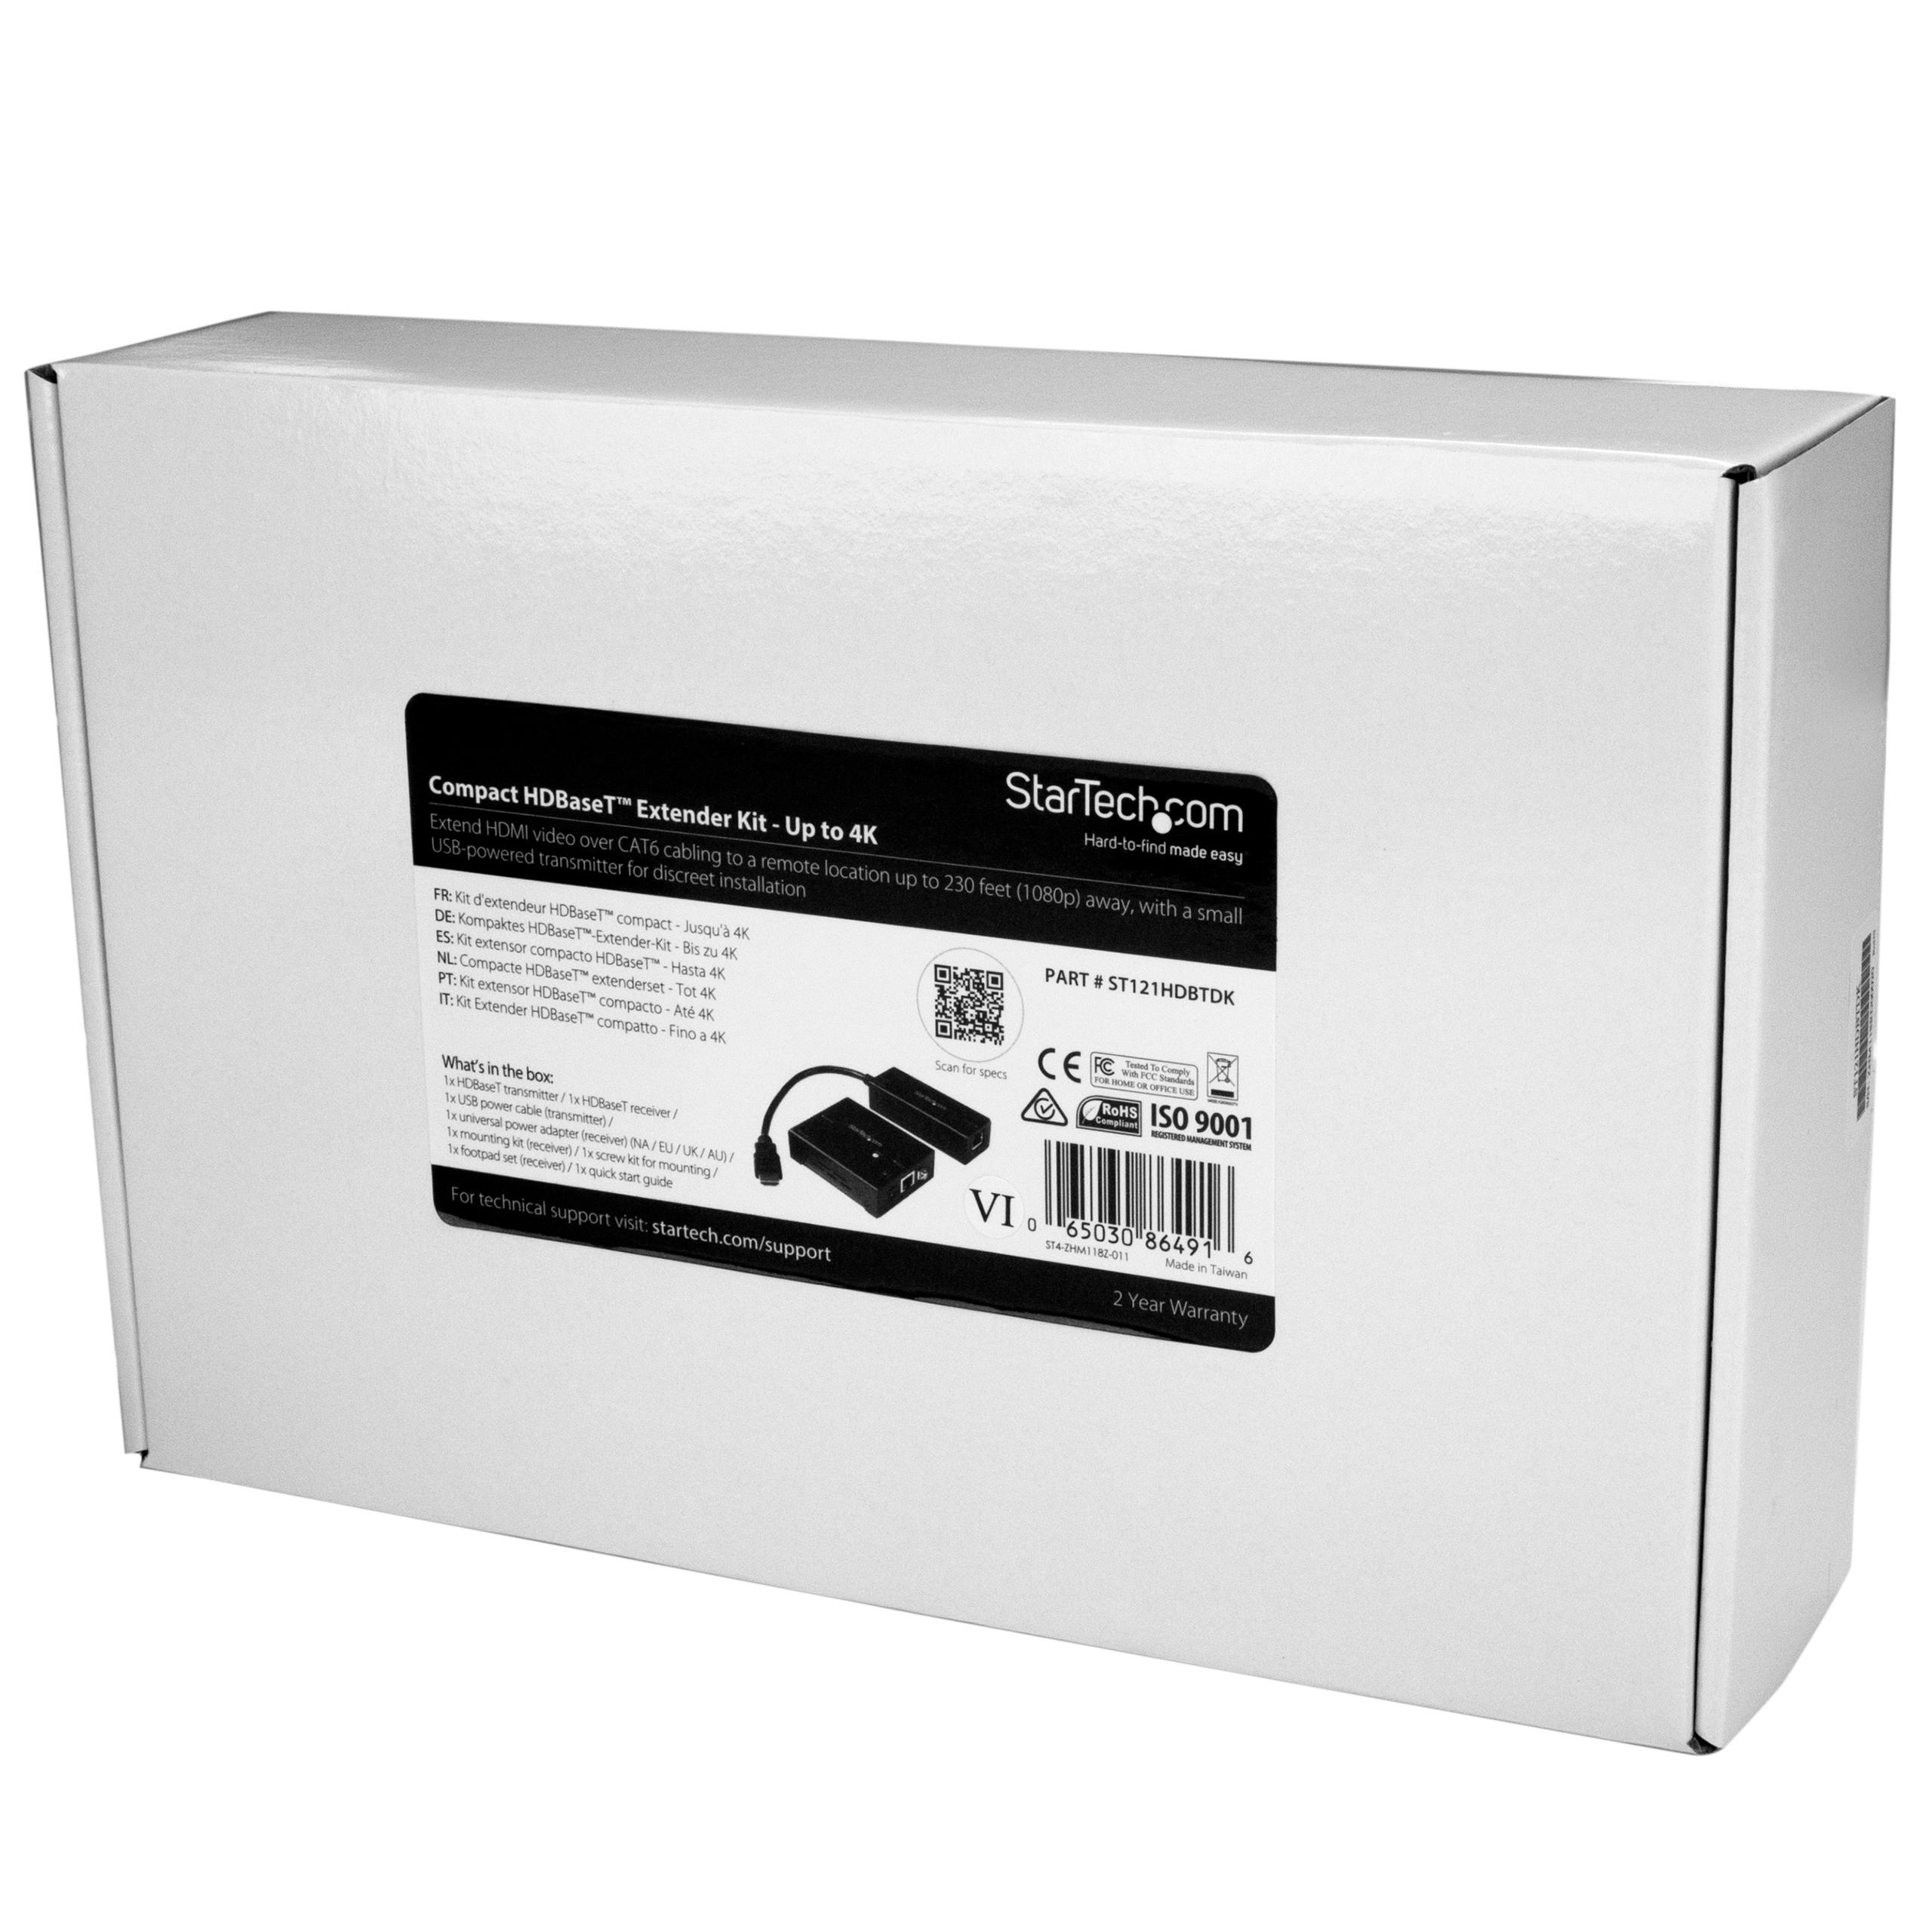 amazon com startech com hdbaset extender kit with compact rh amazon com